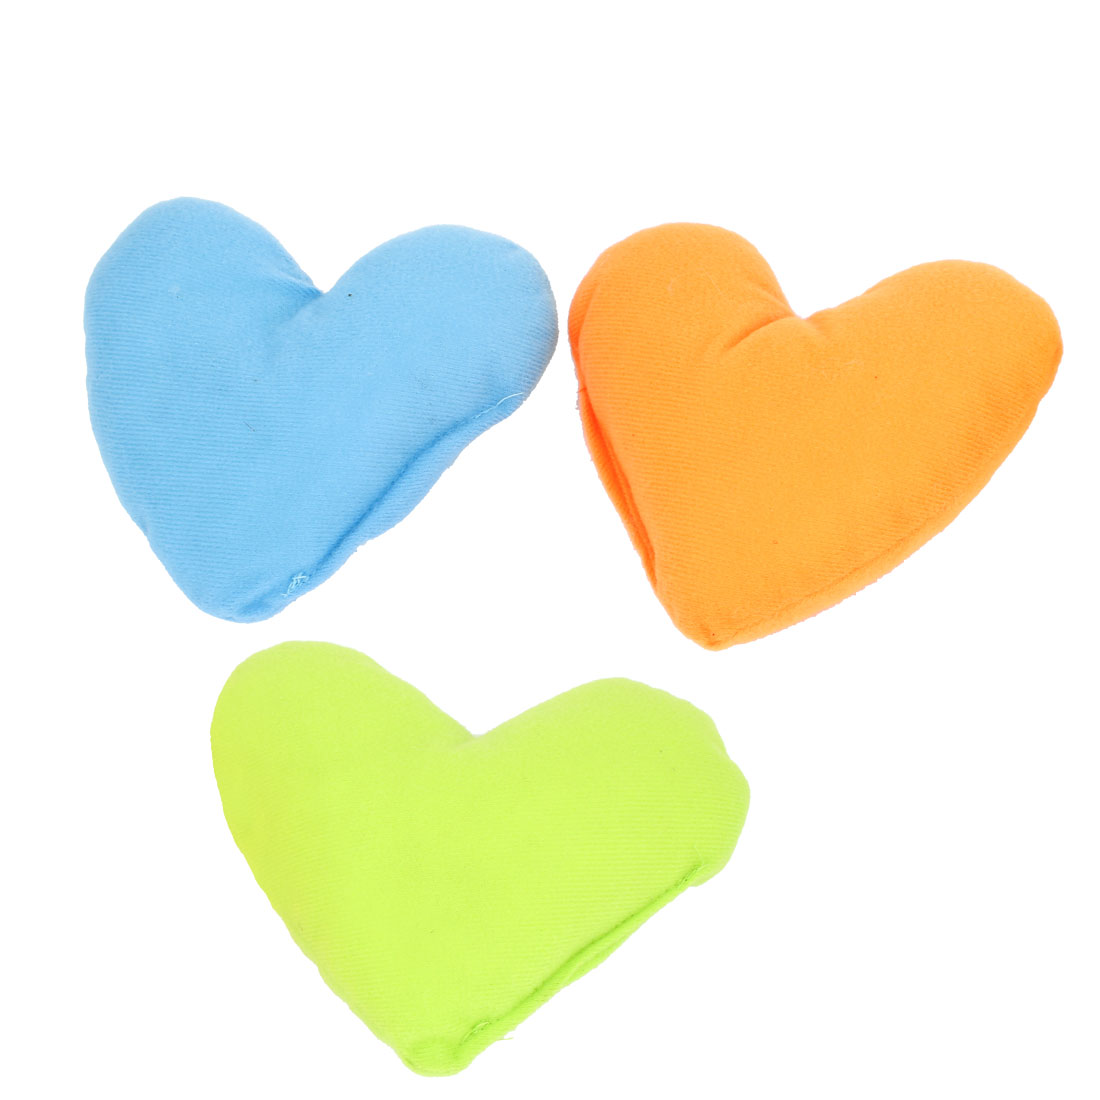 3pcs Blue Orange Green Fleece Heart Design Neck Pillow Cushion Pad for Pet Dog Doggy